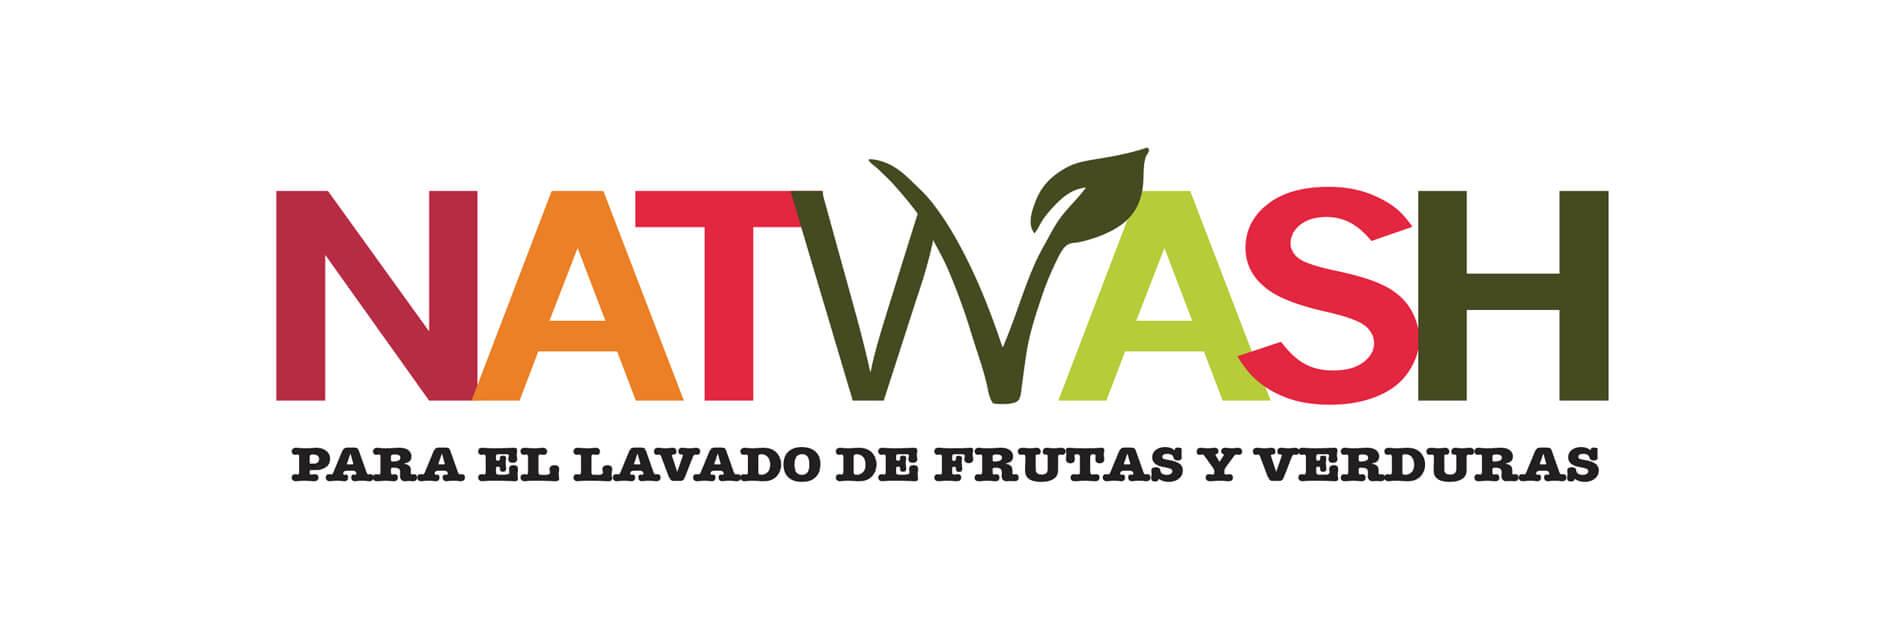 logo Natwash copia